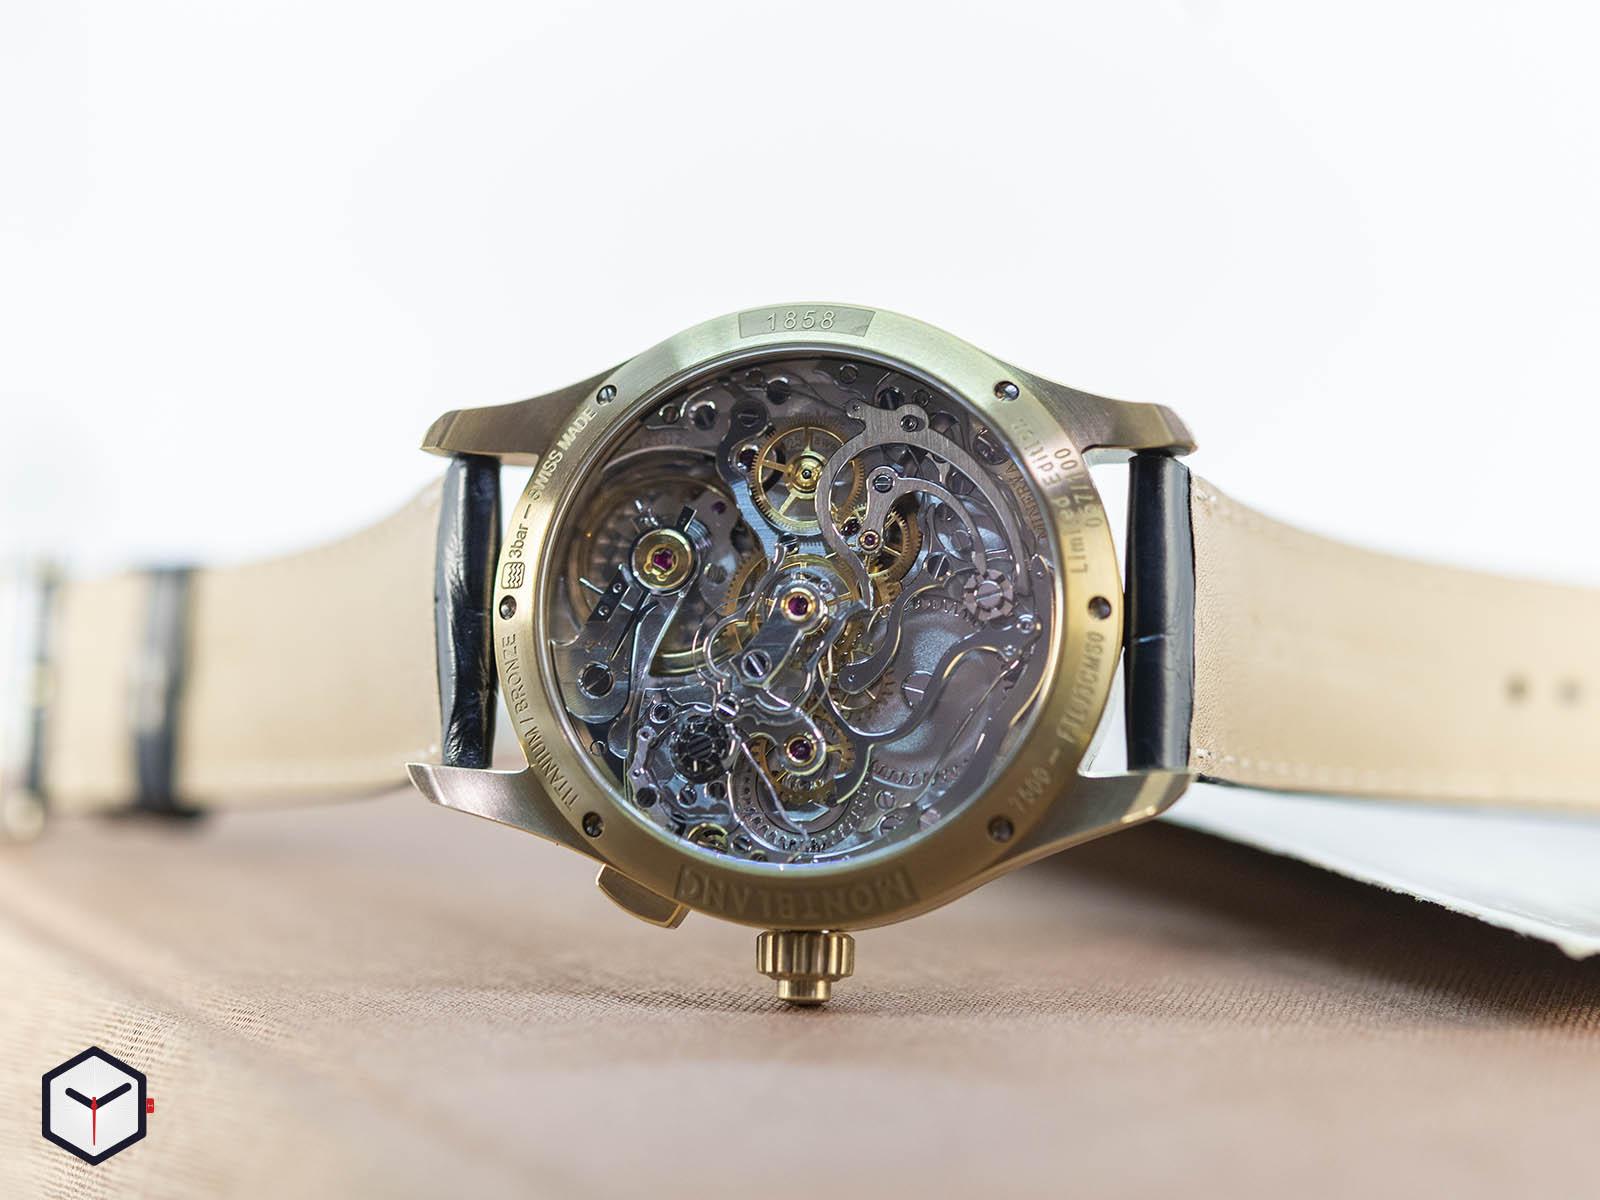 montblanc-1858-split-second-chronograph-5.jpg